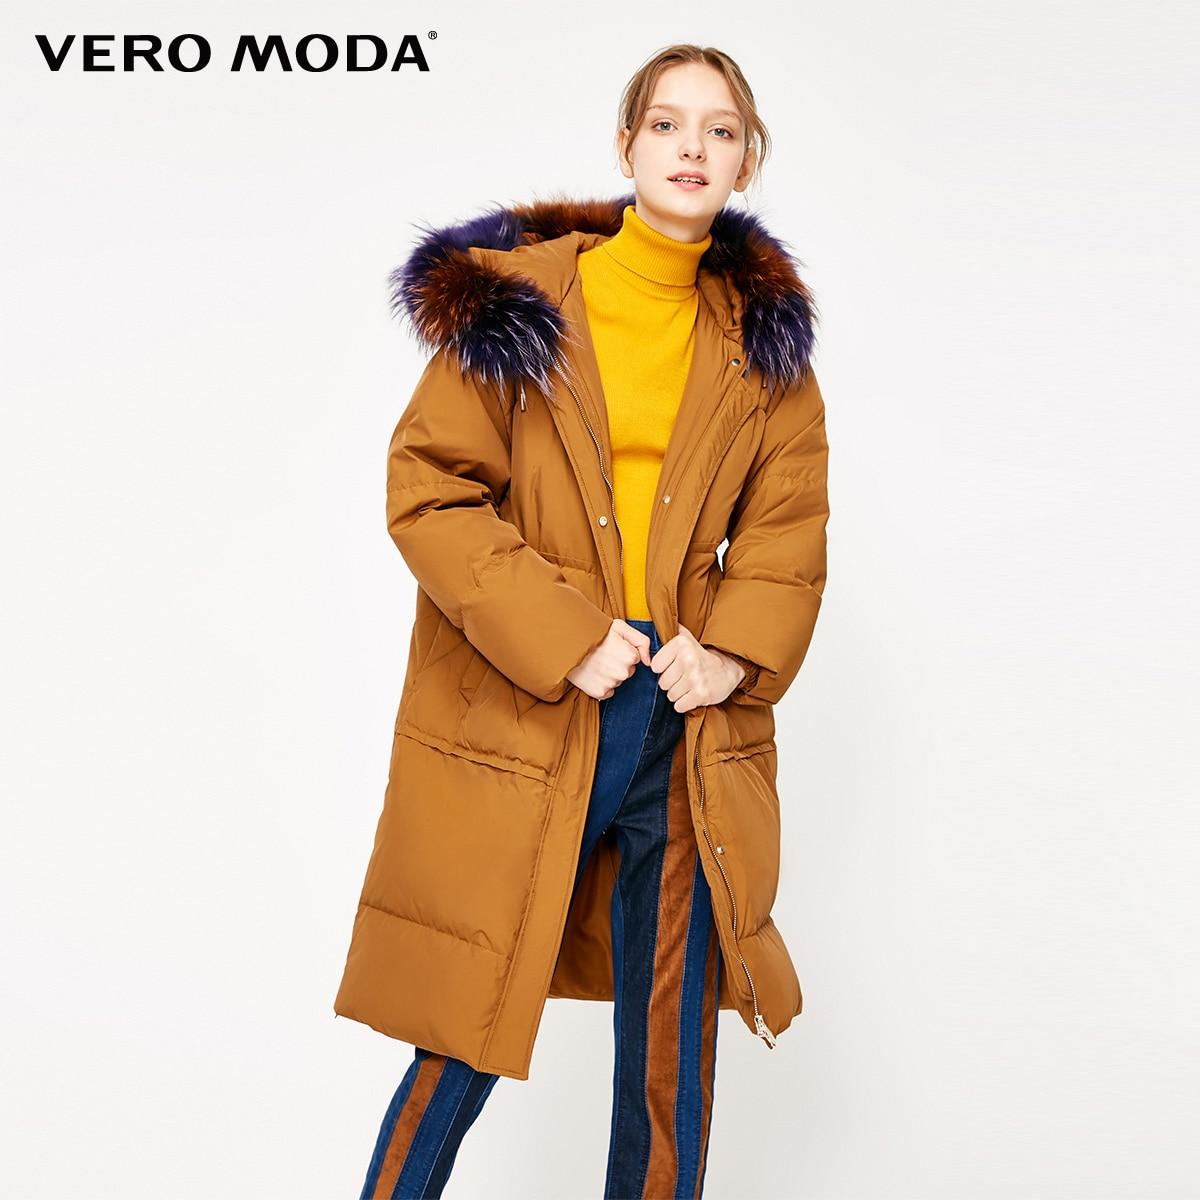 Vero Moda Women's 80% White Duck Down Raccoon Fur Collar Detachable Long Down Jacket | 318412555